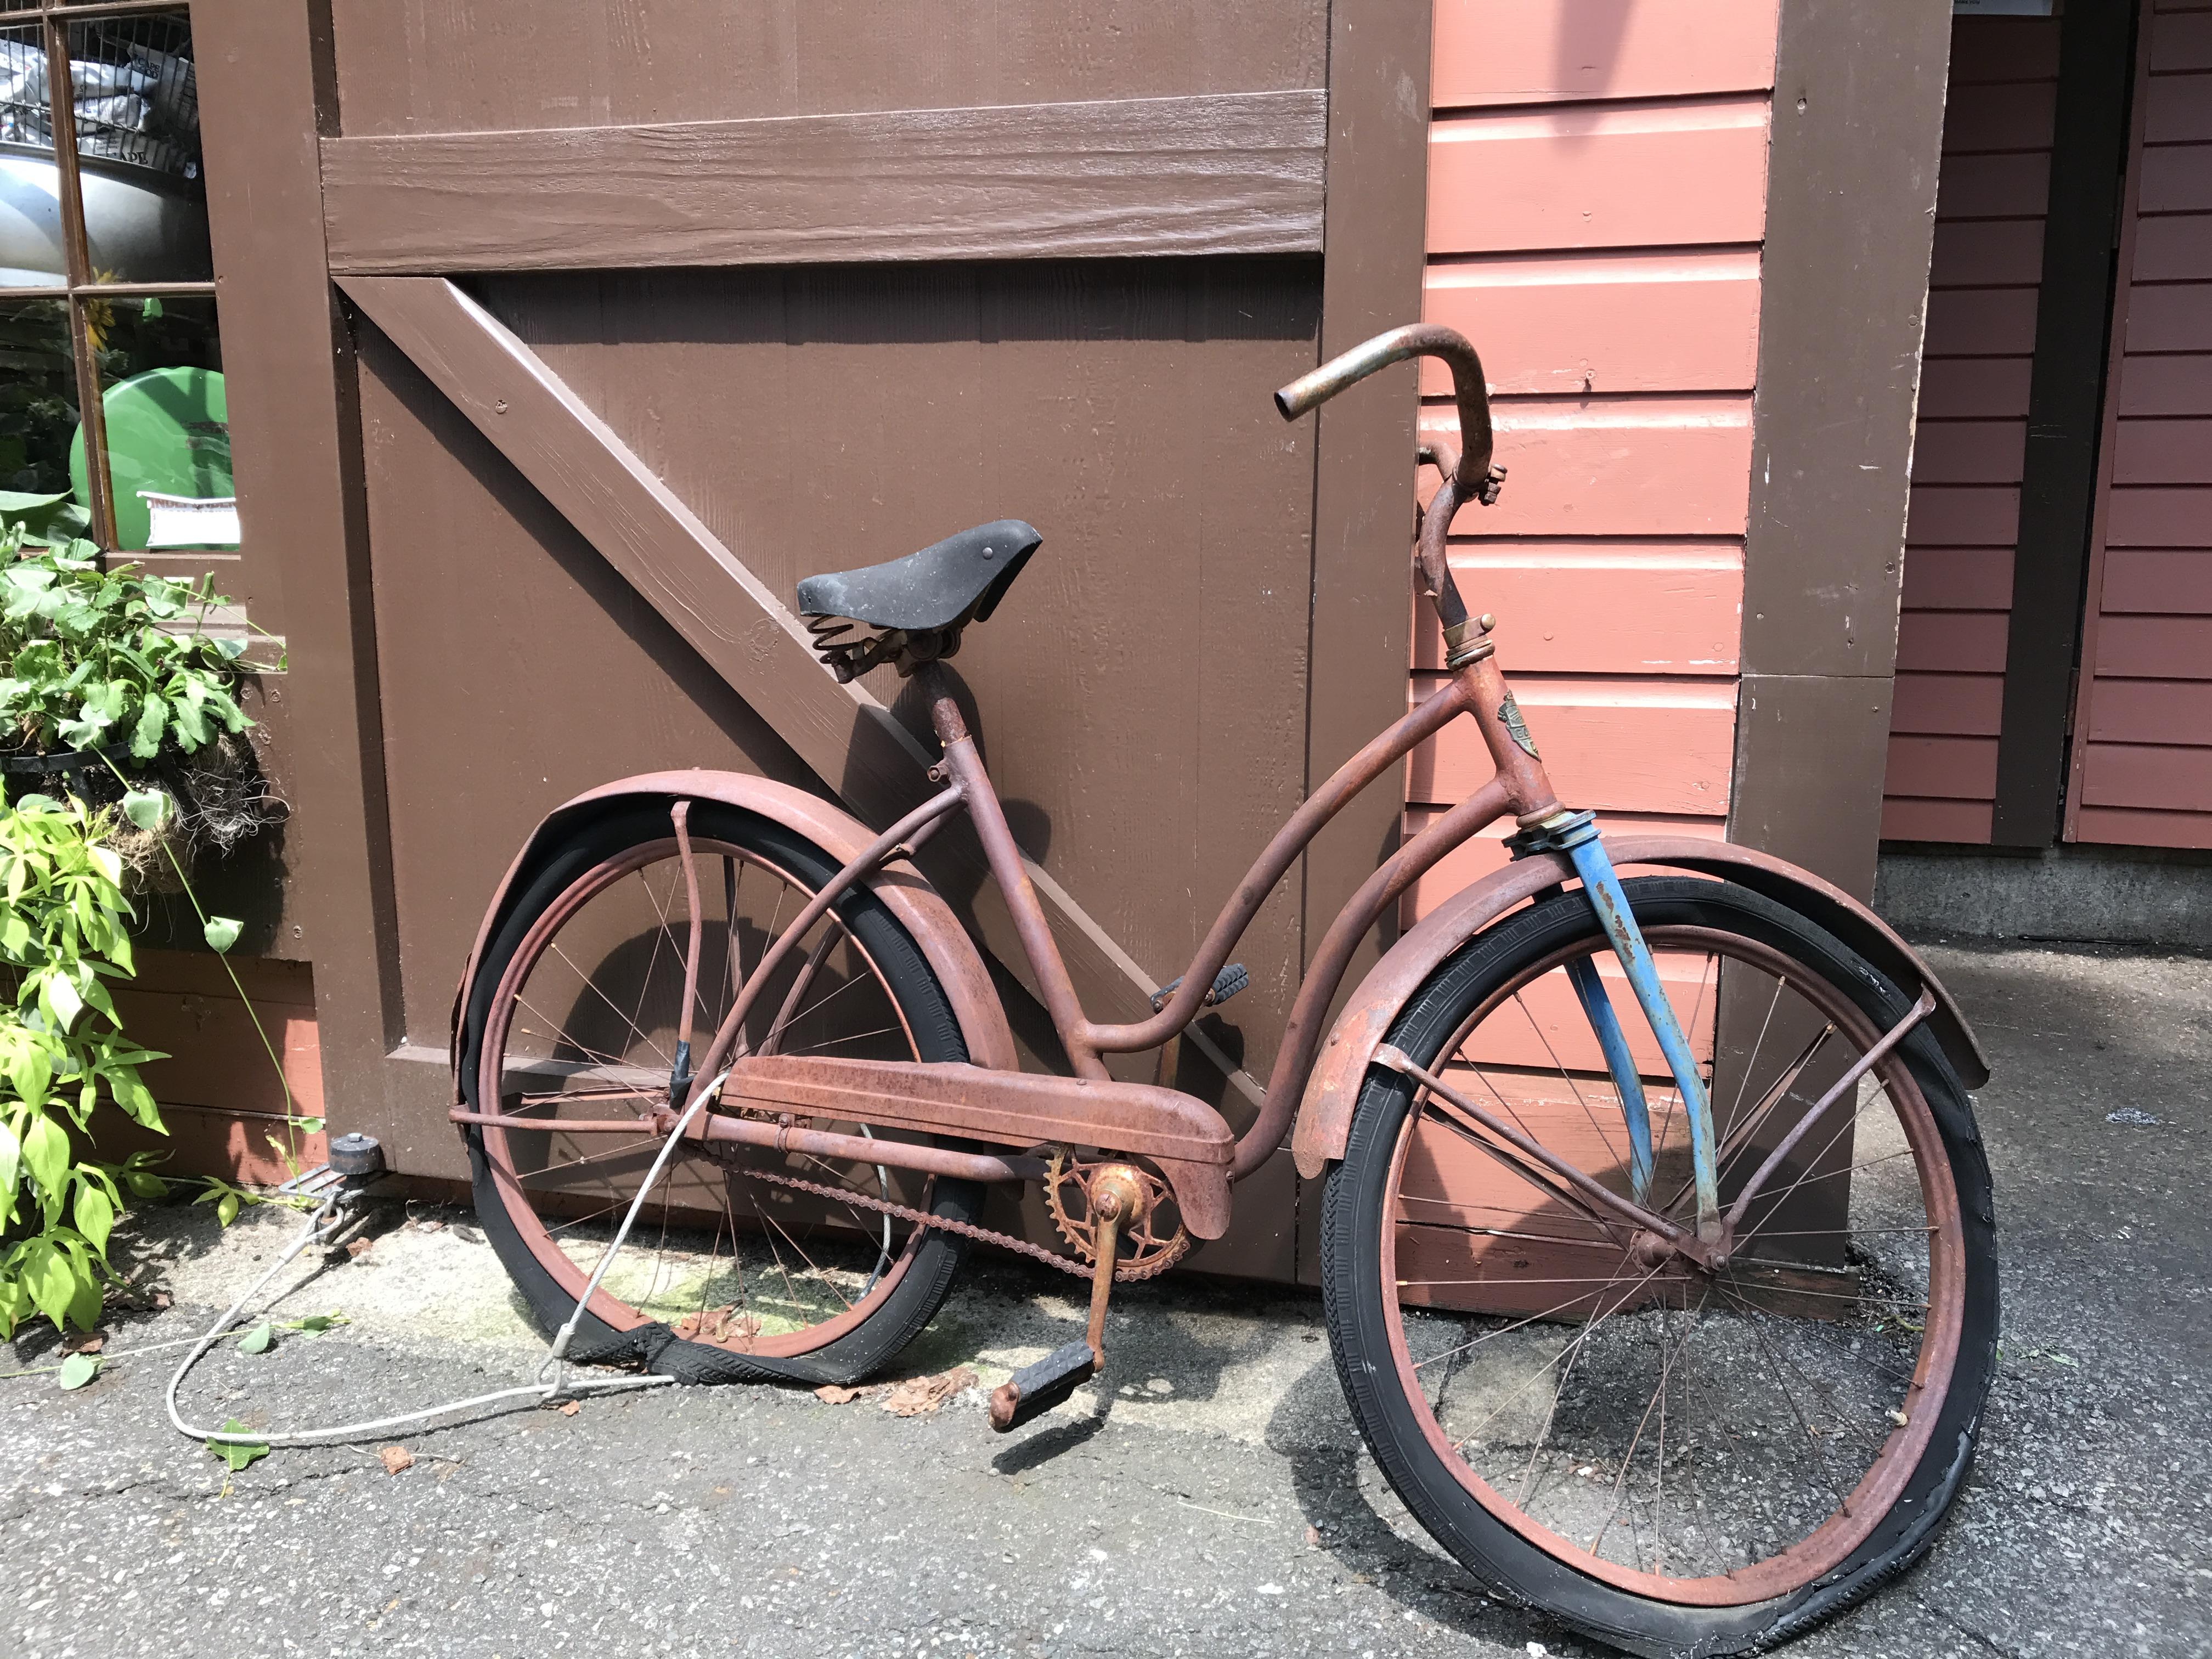 Old_Bicycle_Boston.jpeg